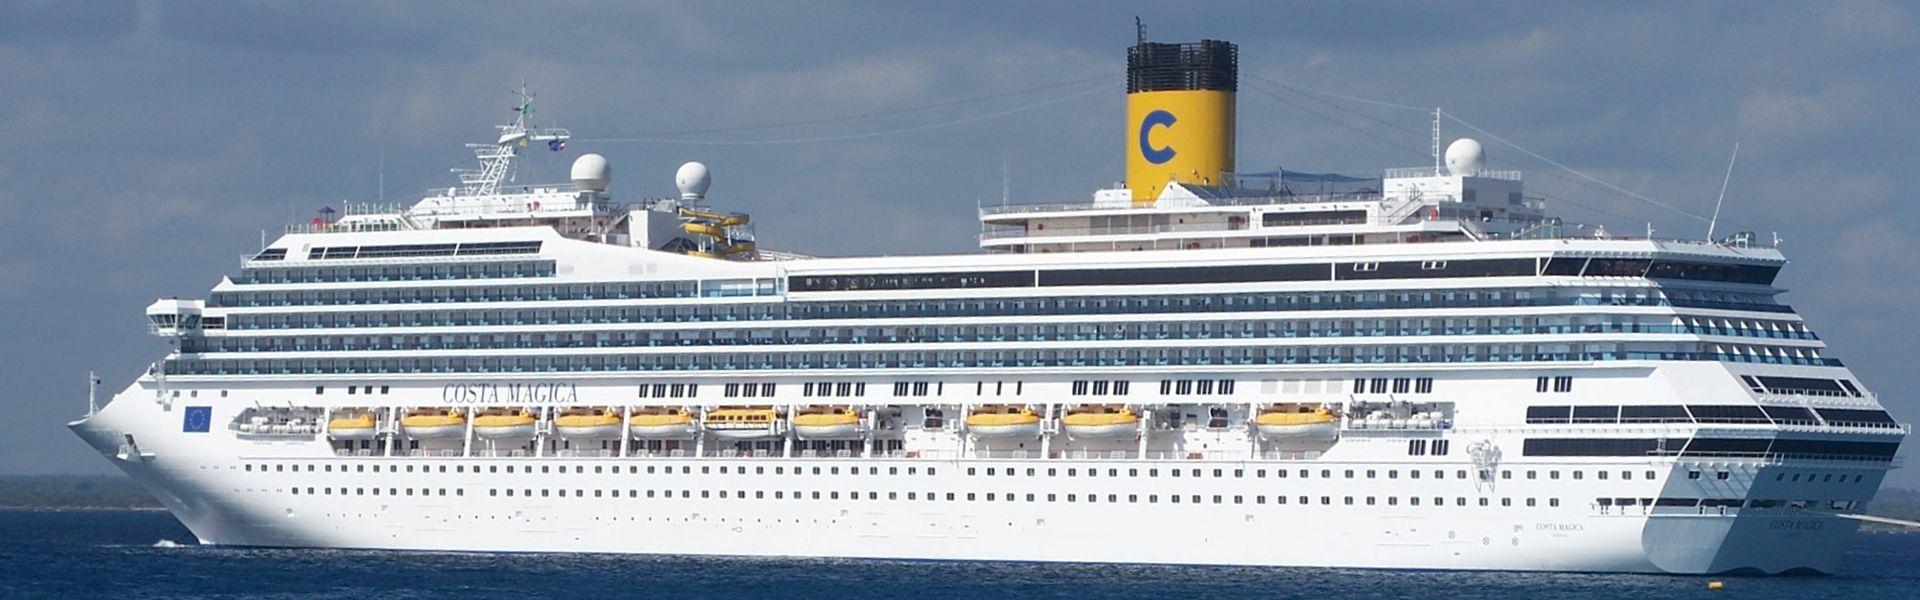 Croaziera 2017 -  Insulele Canare (Savona) - Costa Cruises - Costa Magica - 11 nopti